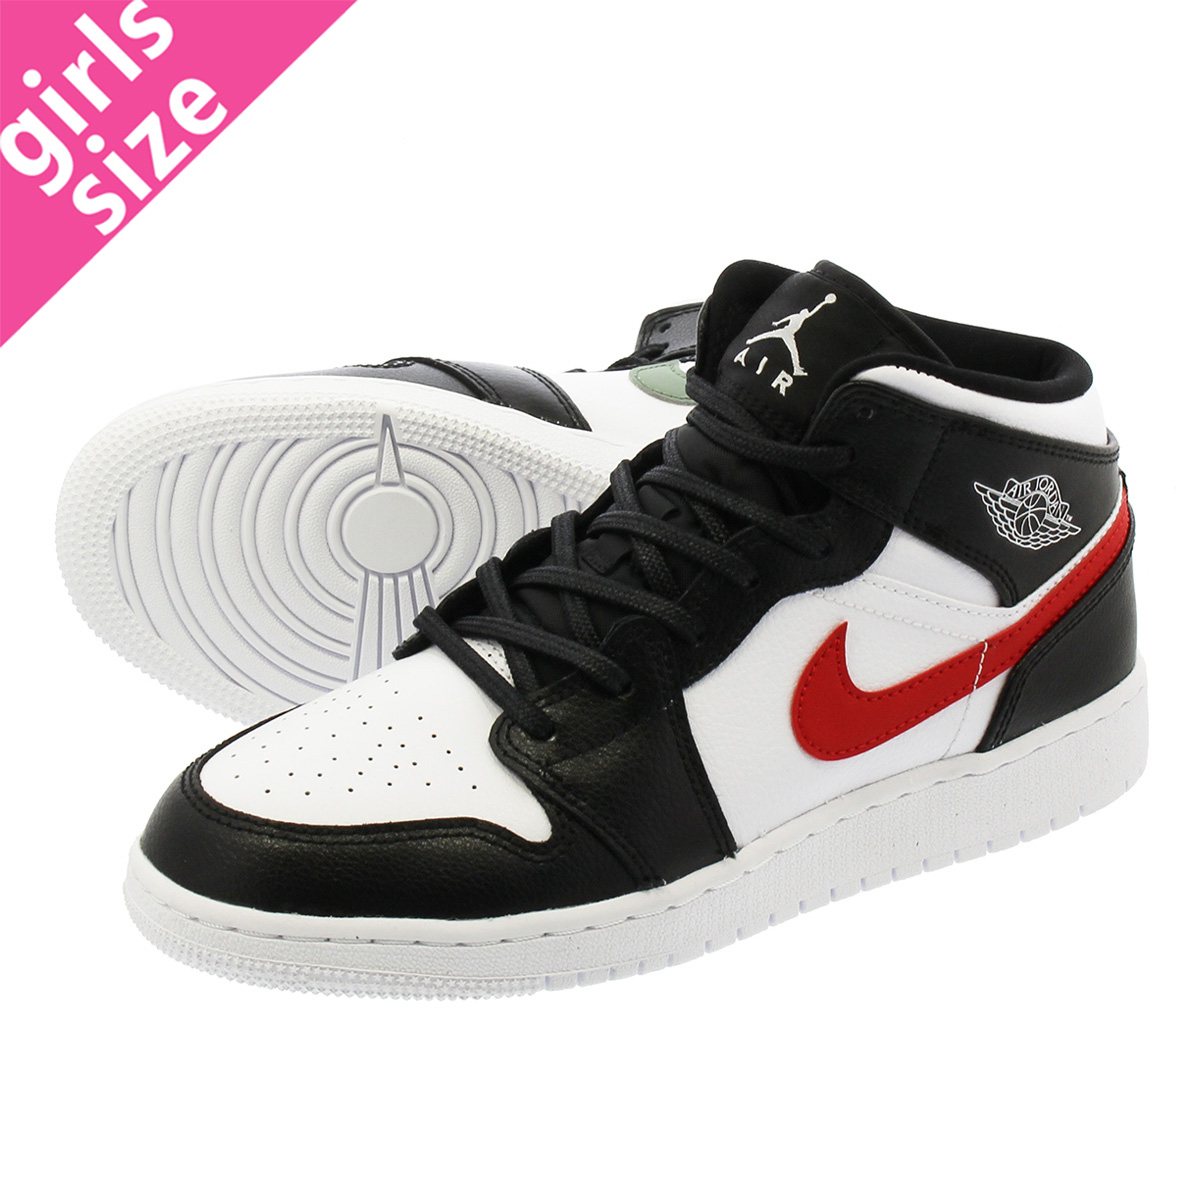 promo code 2b35a 00ad9 NIKE AIR JORDAN 1 MID BG Nike Air Jordan 1 mid BG  BLACK/WHITE/RED/YELLOW/BLUE/GREEN 554,725-052